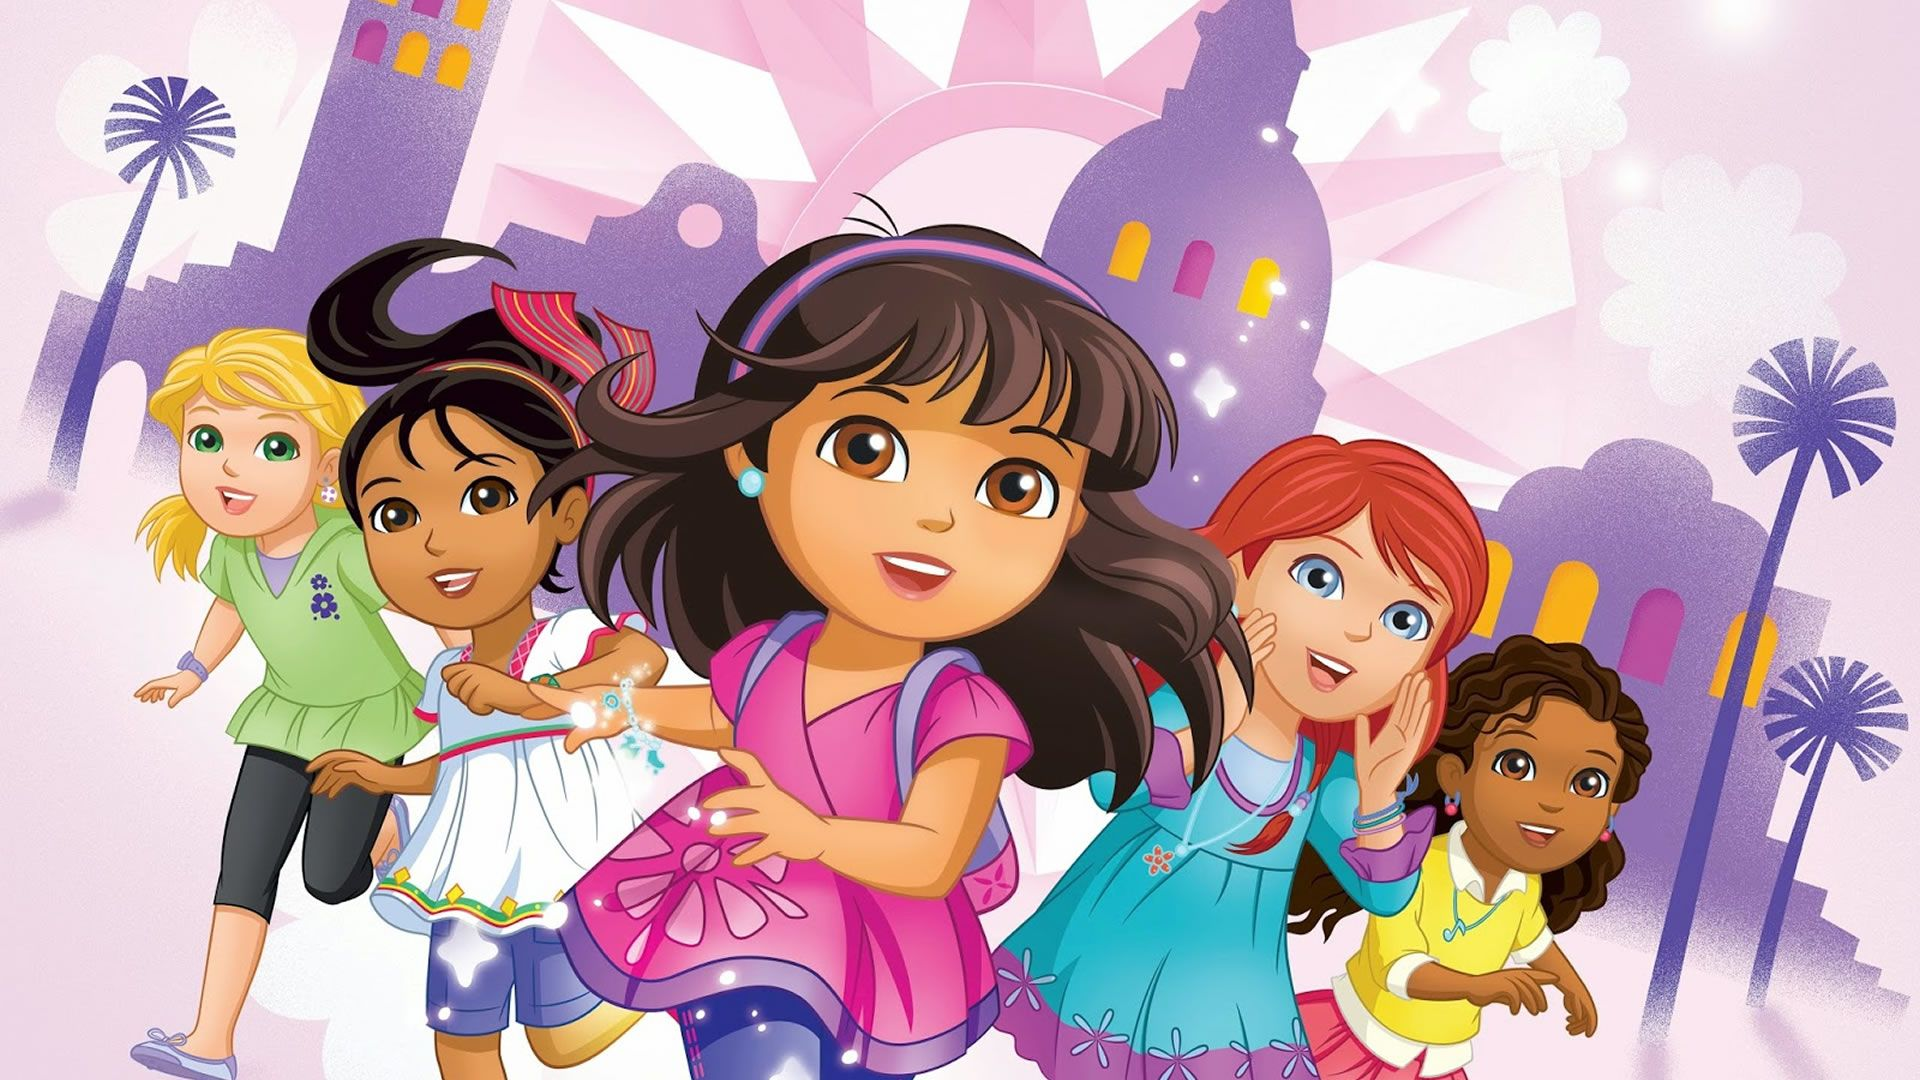 Dora full hd wallpaper download